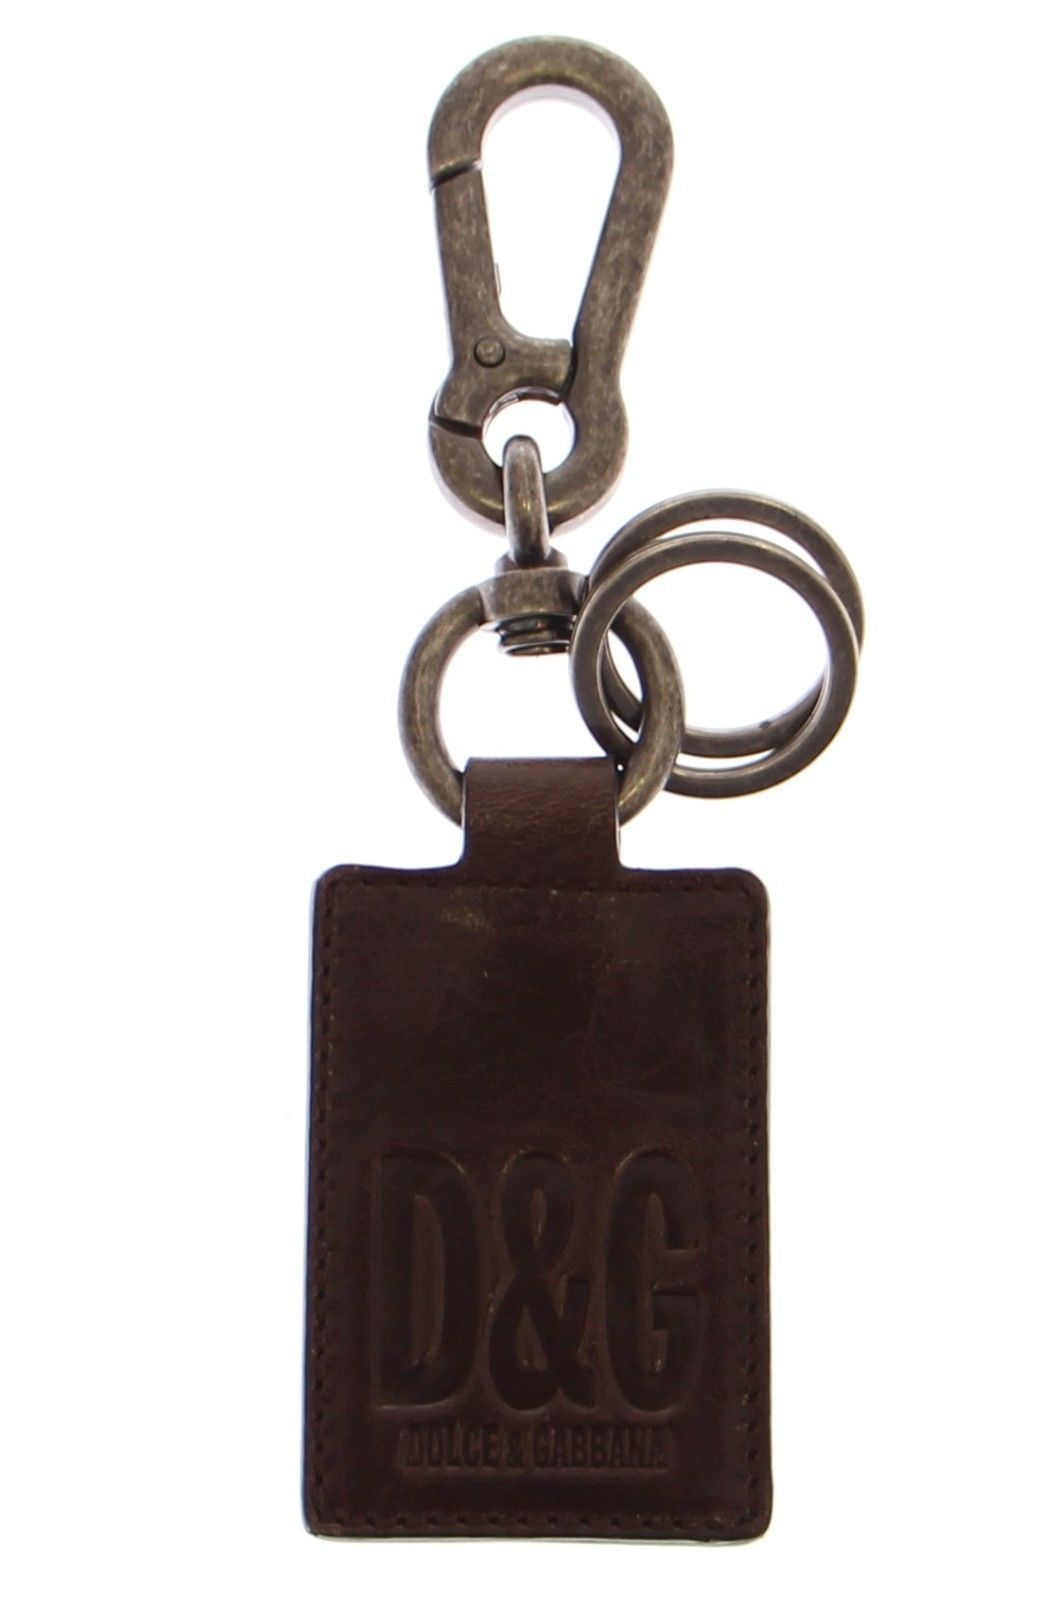 Dolce & Gabbana Leather Metal Unisex Ring Keychain